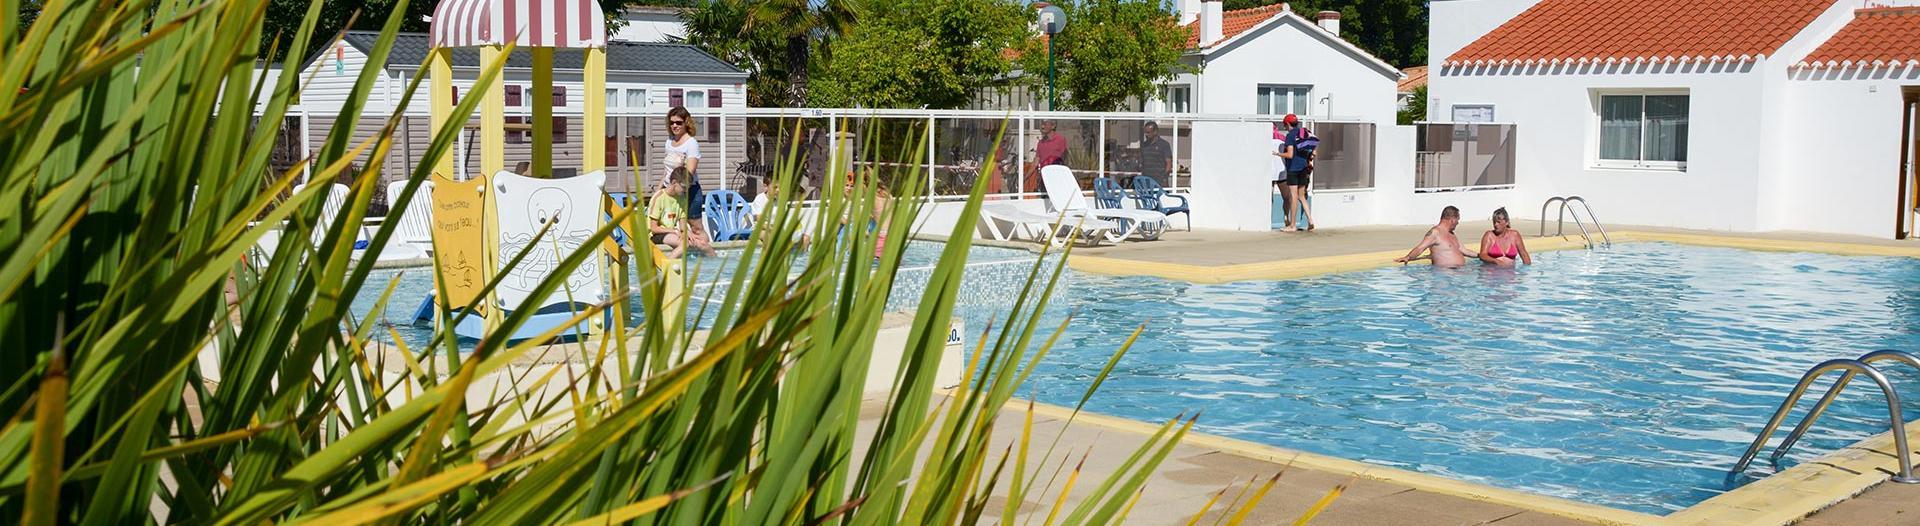 slider-camping-la-paree-preneau-vue-piscine